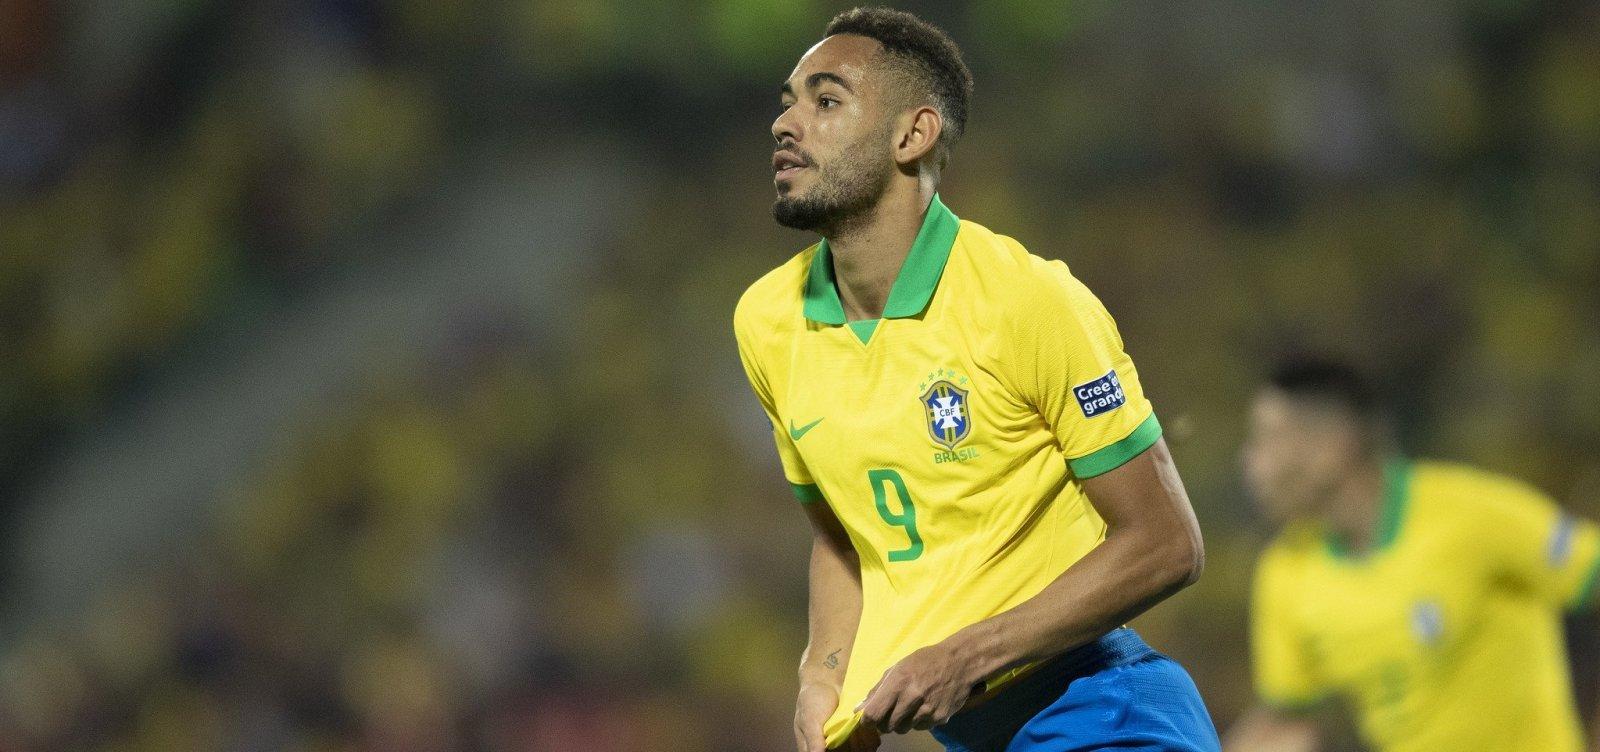 [Brasil vence Argentina e garante vaga nas Olimpíadas de Tóquio-2020]